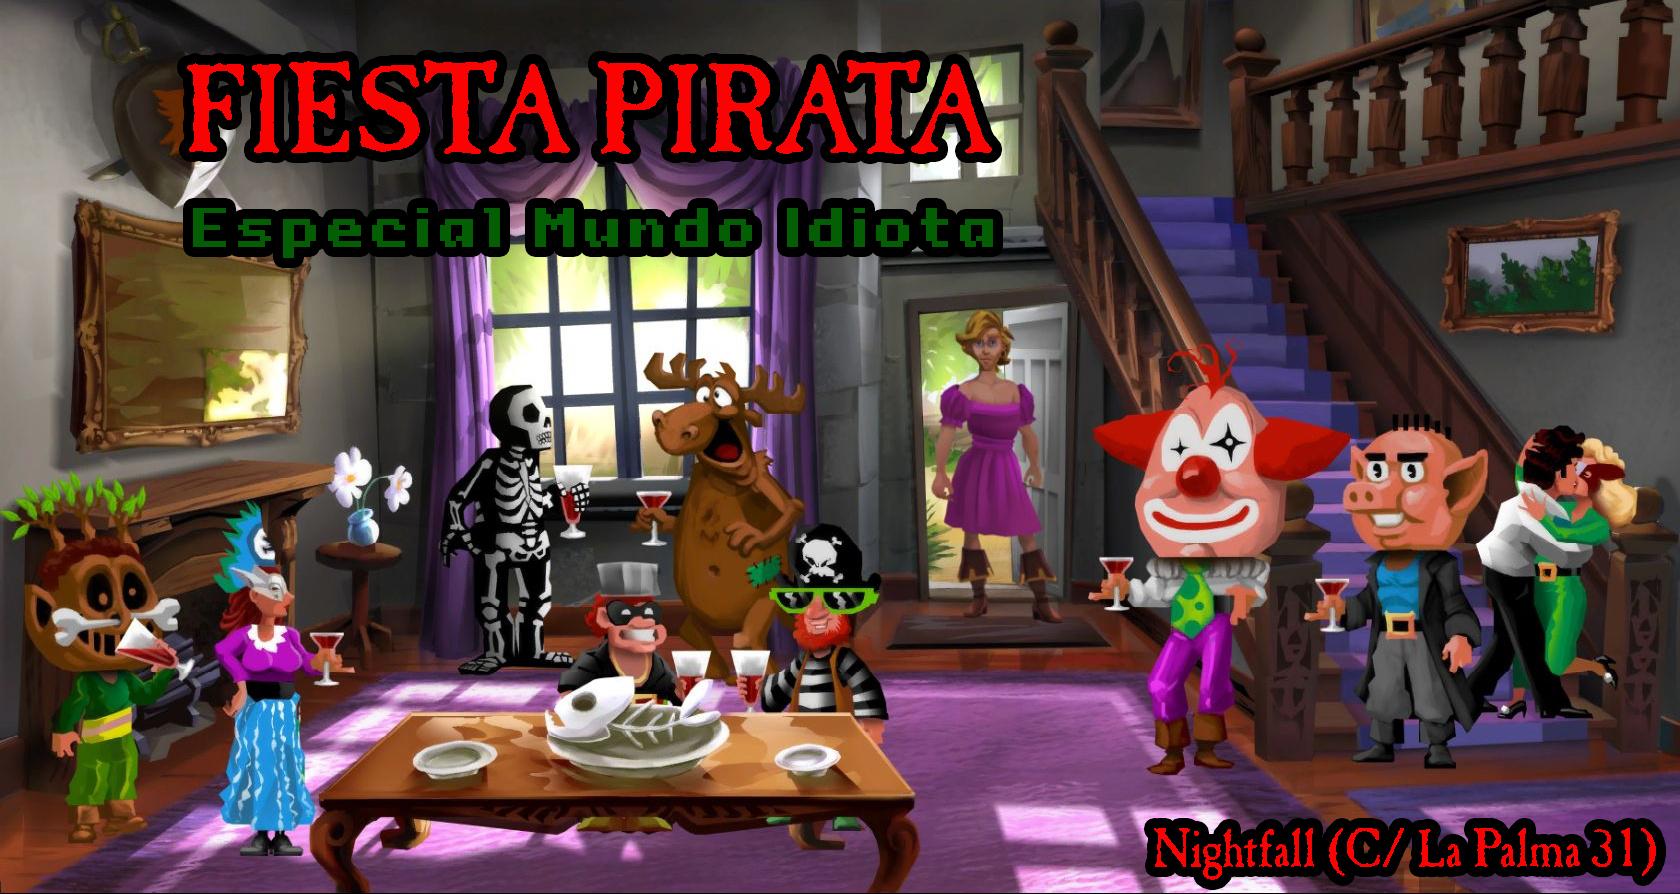 fiesta-pirata-nightfall